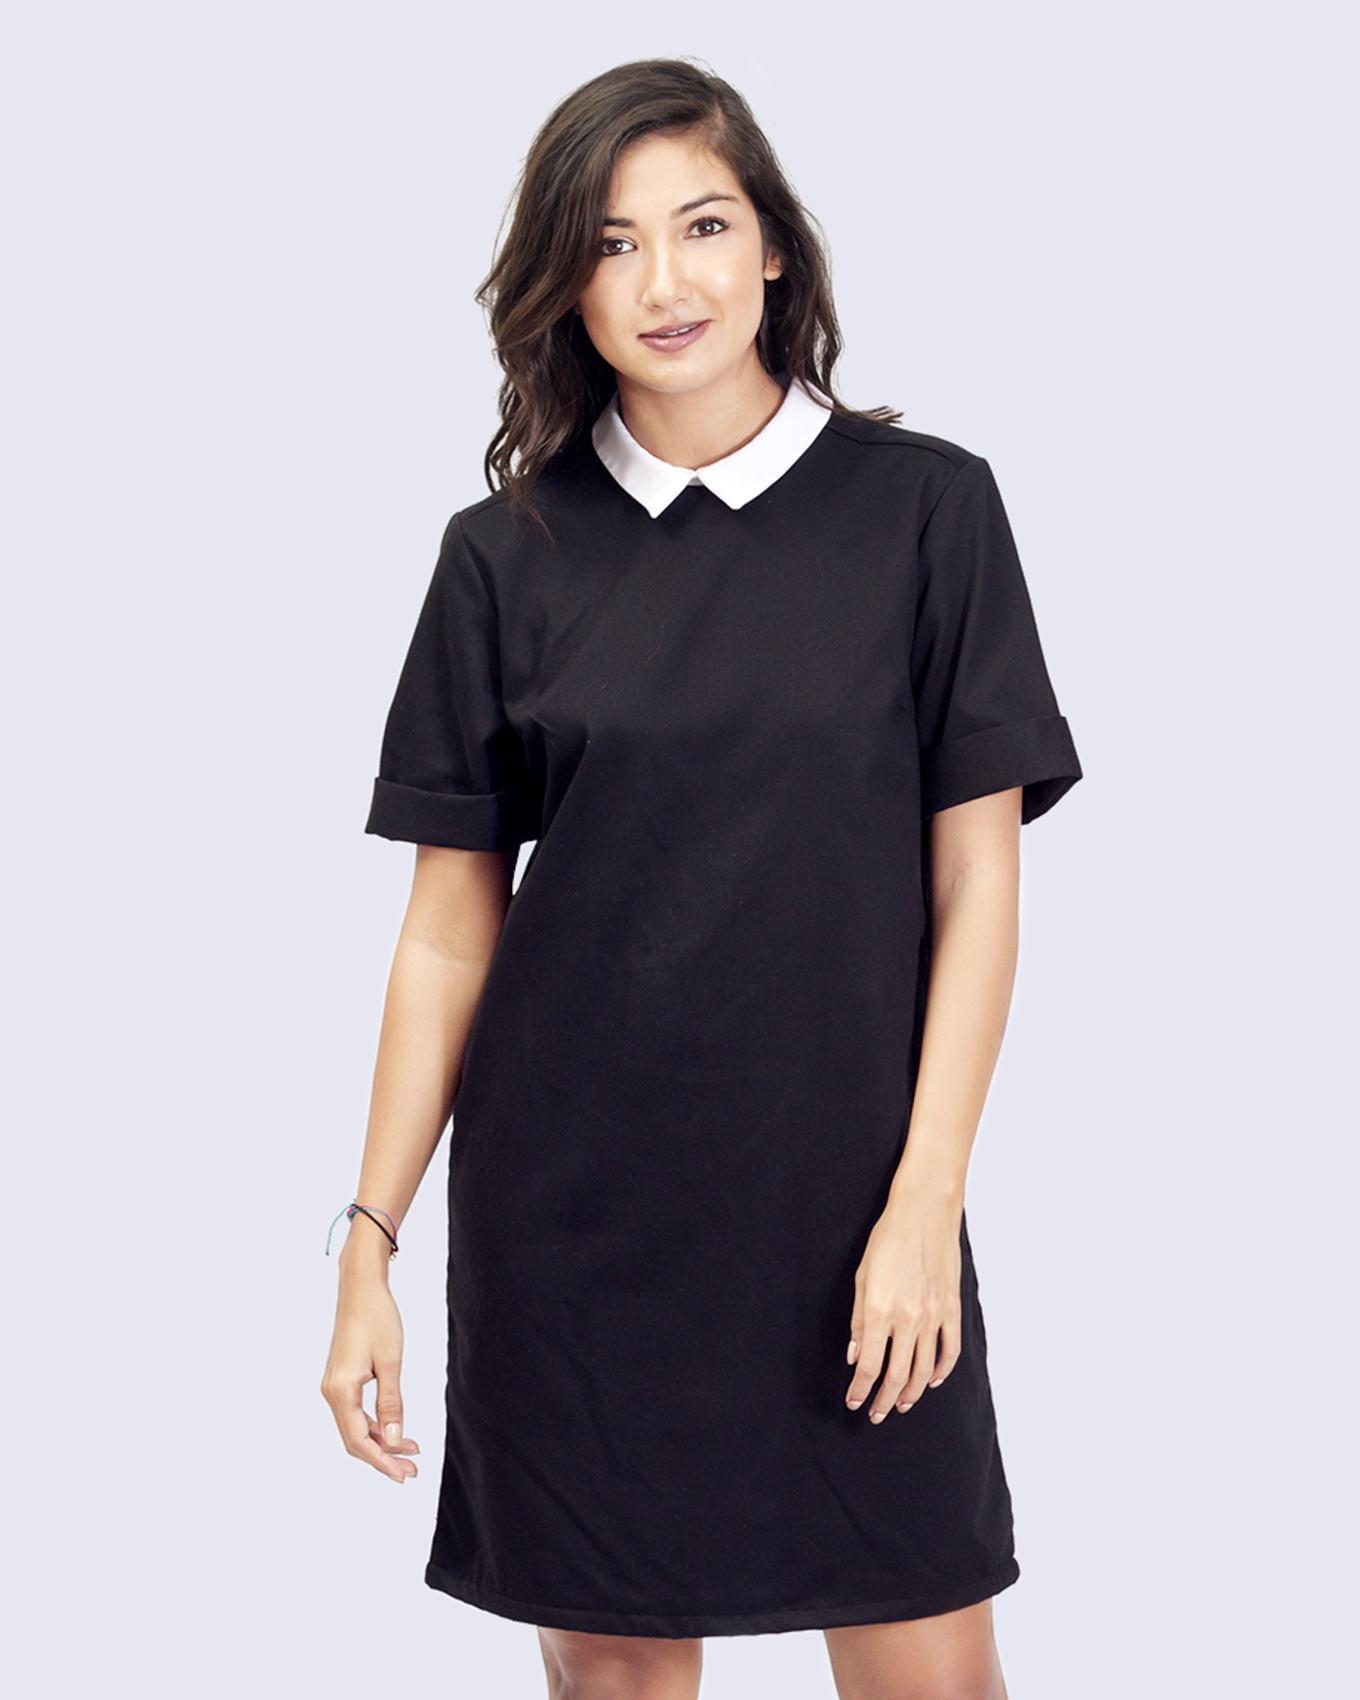 Women's Black & White Charcoal Shirt Dress